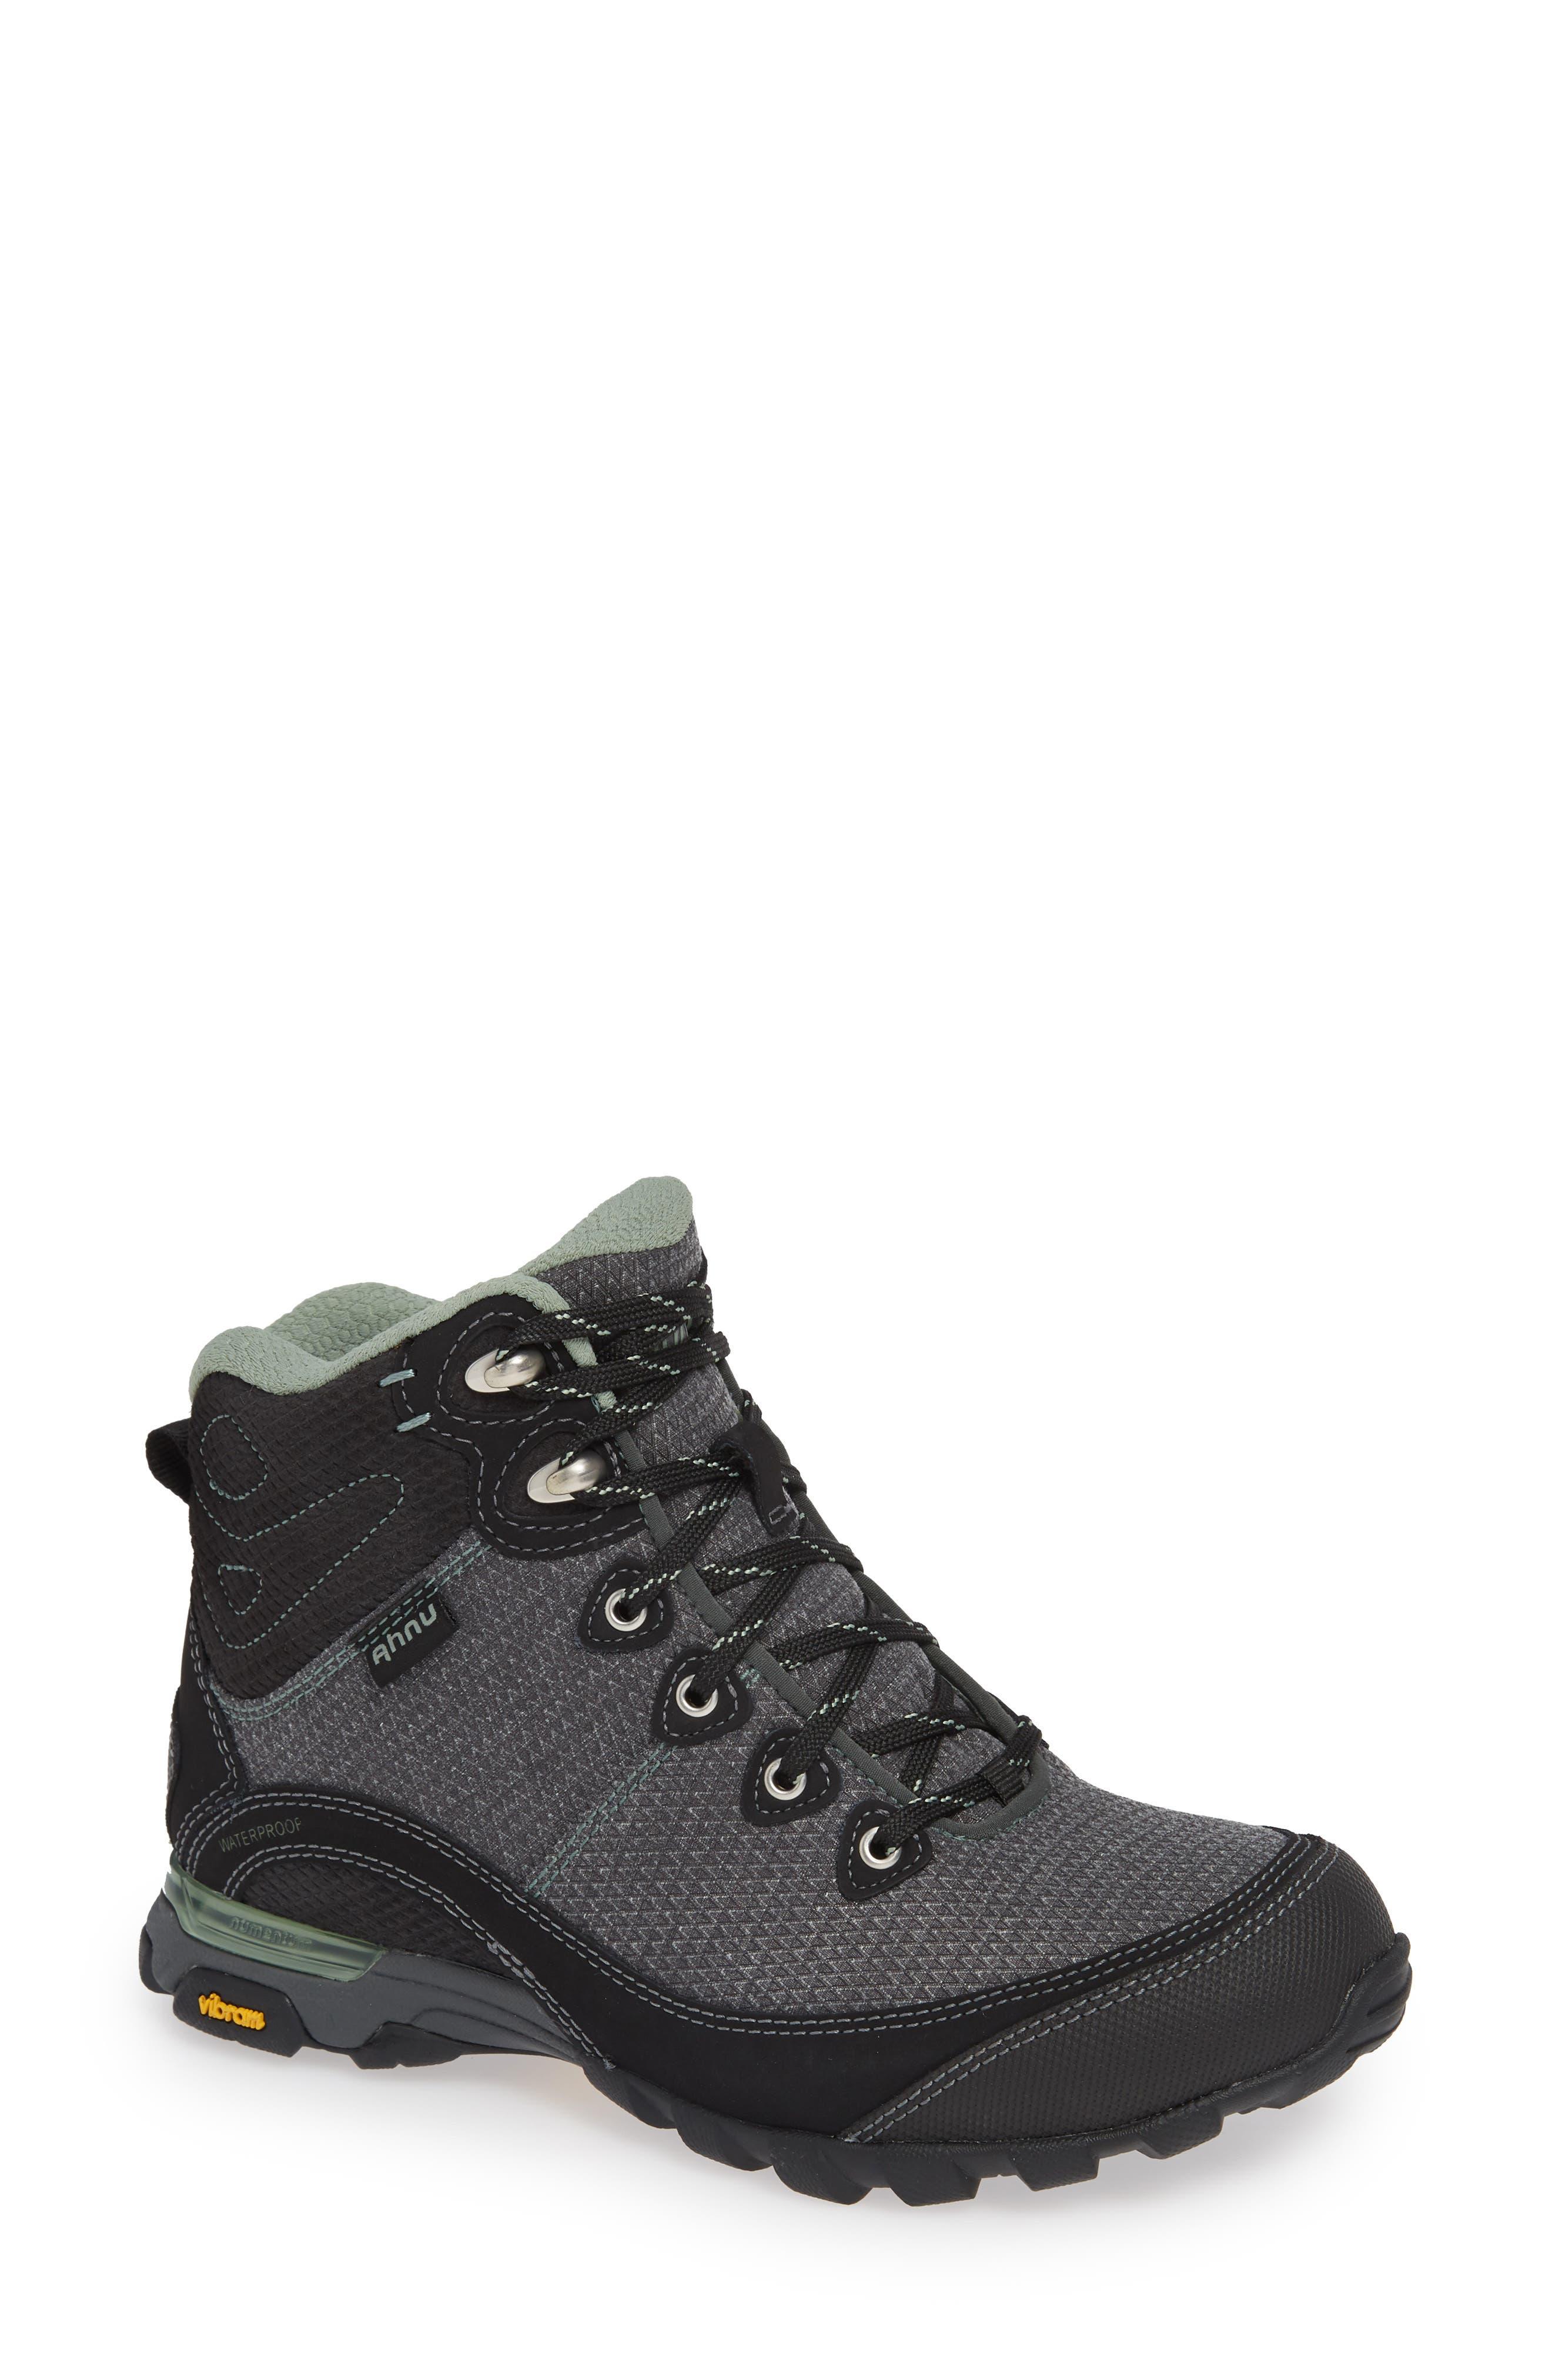 Ahnu by Teva Sugarpine II Waterproof Hiking Boot,                             Main thumbnail 1, color,                             BLACK/ GREEN BAY FABRIC